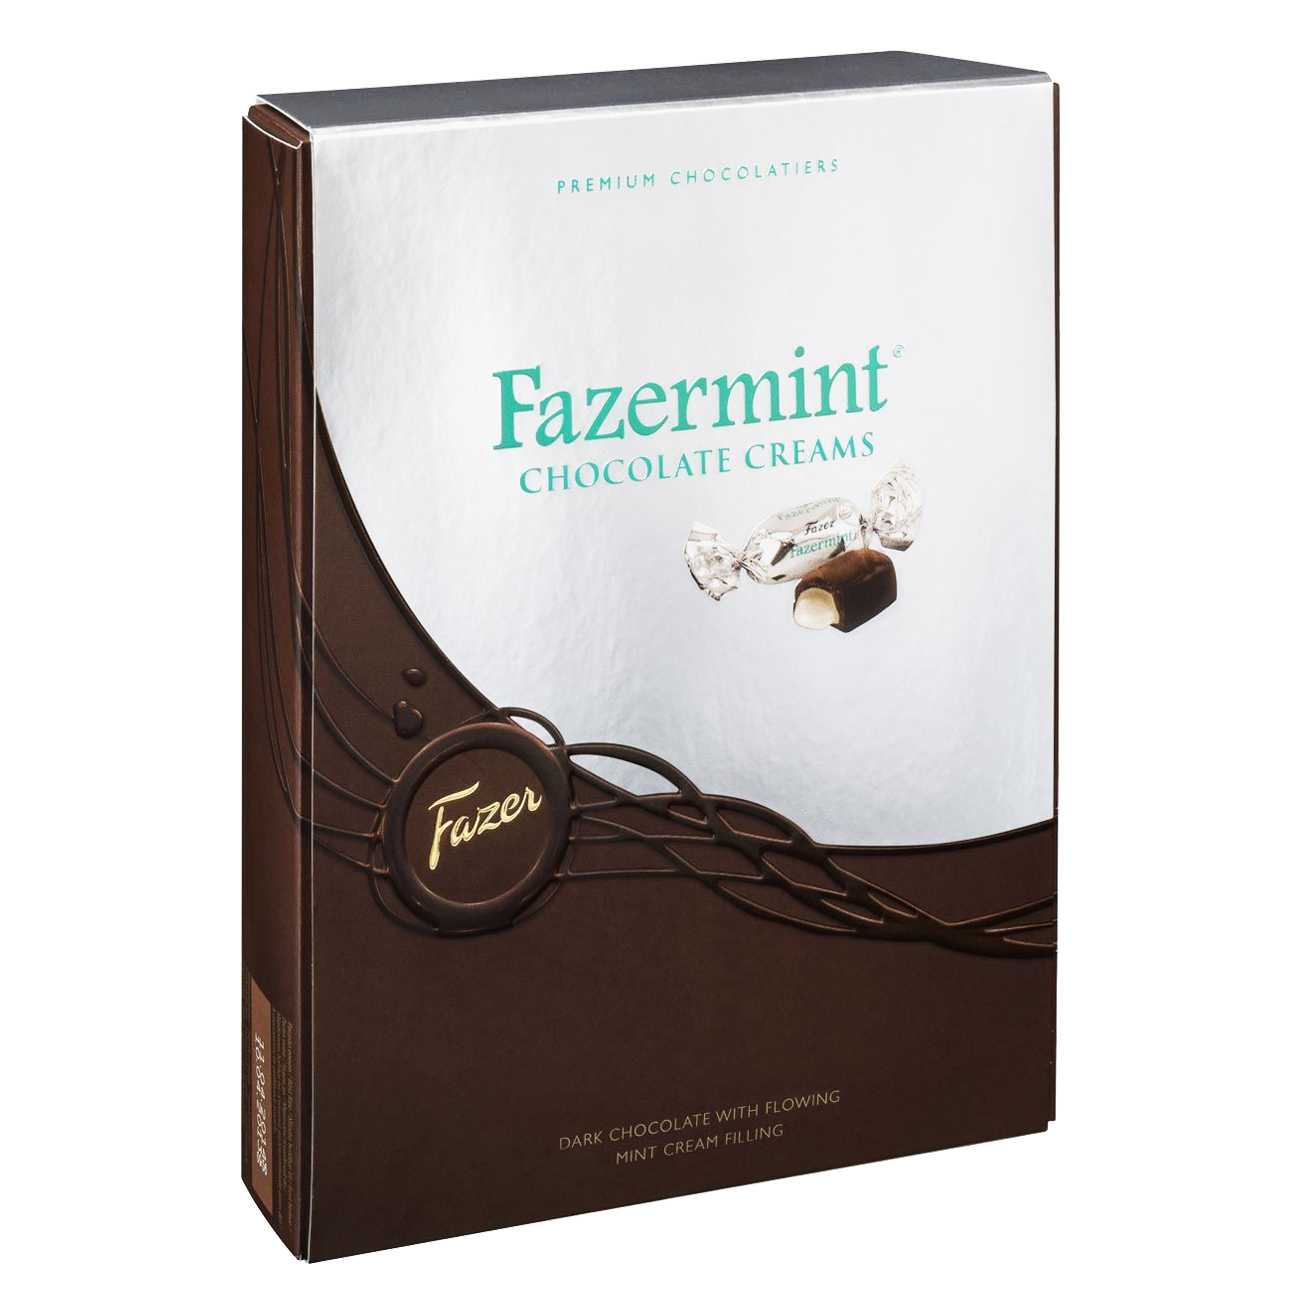 FAZERMINT CHOCOLATE CREAMS 300 G